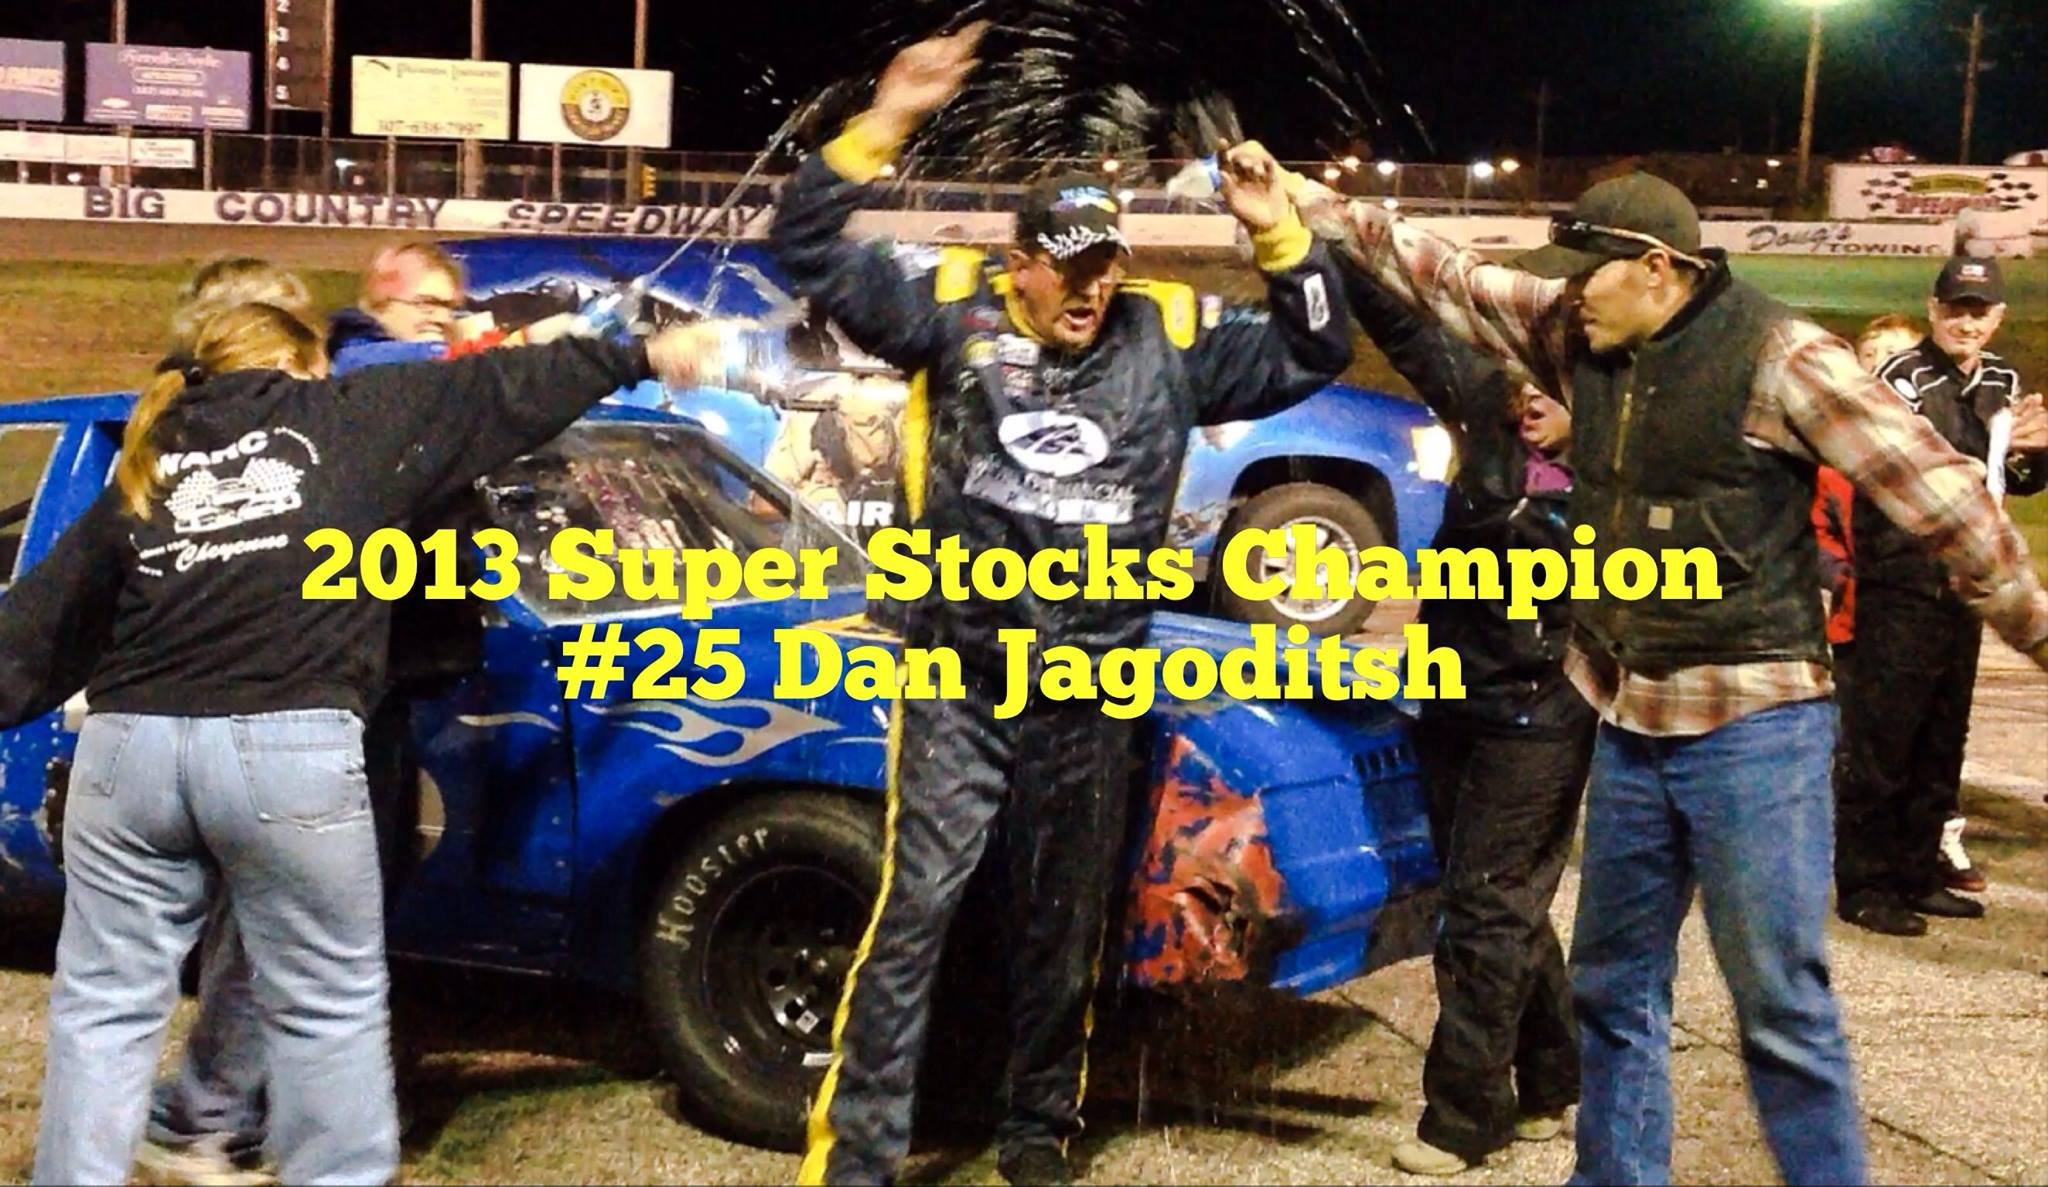 Dan Jagoditsh SS Champion 2013.jpg